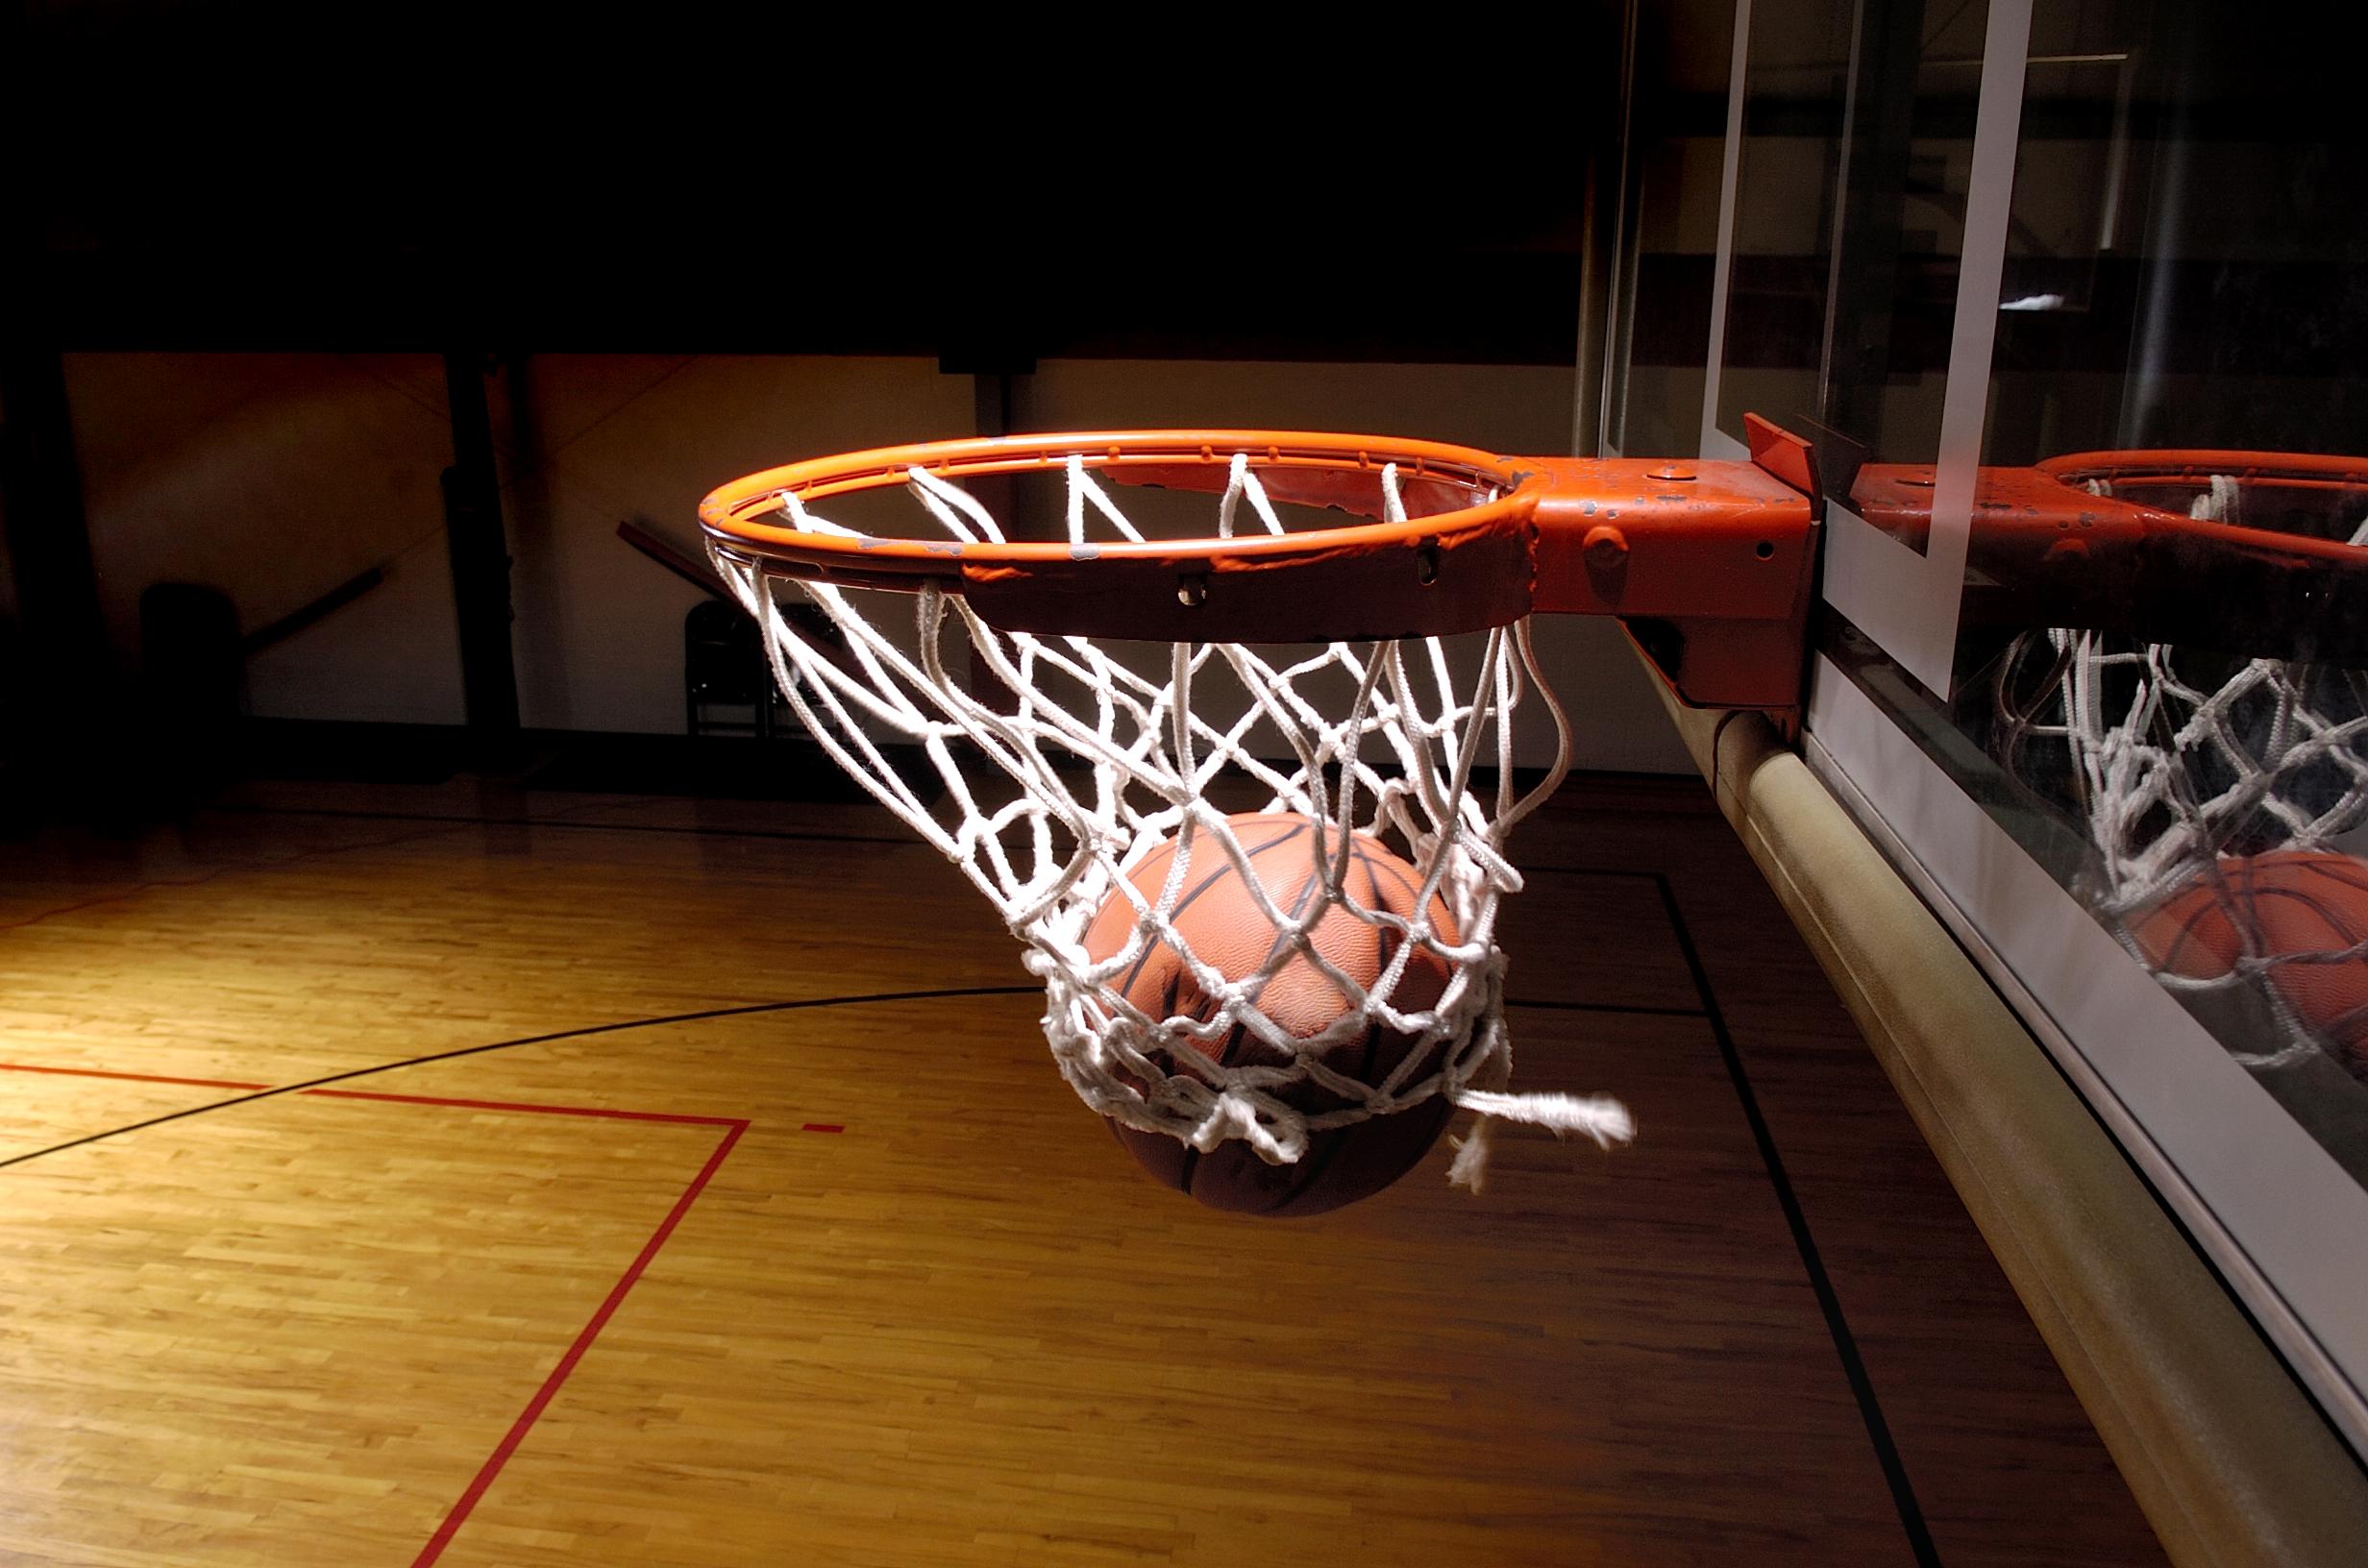 SAIT Trojans women's basketball seeking ACAC title